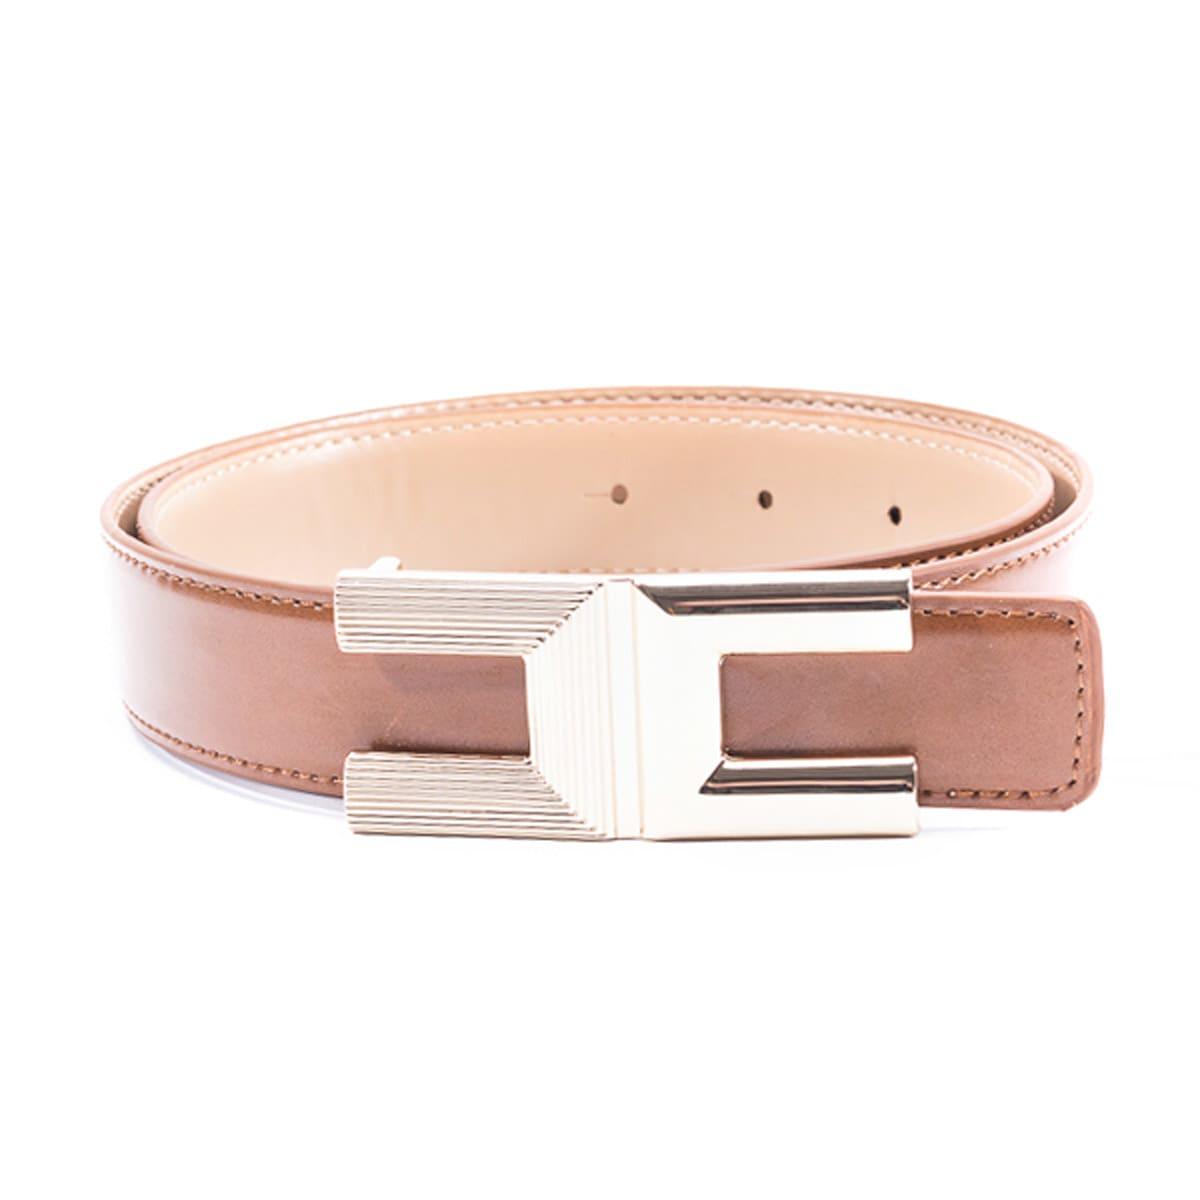 03bf2bd161 Elisabetta Franchi Belt in Brown